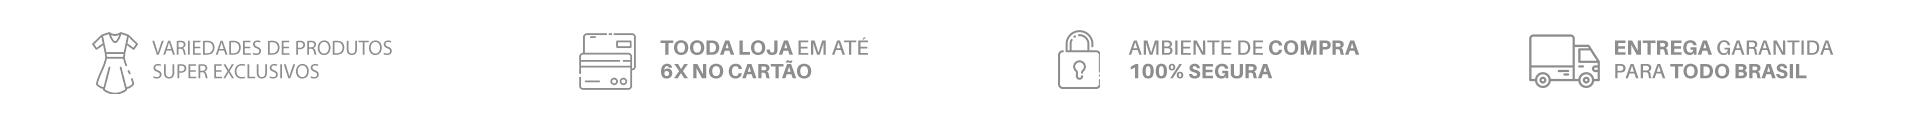 Tarja - Anagrom